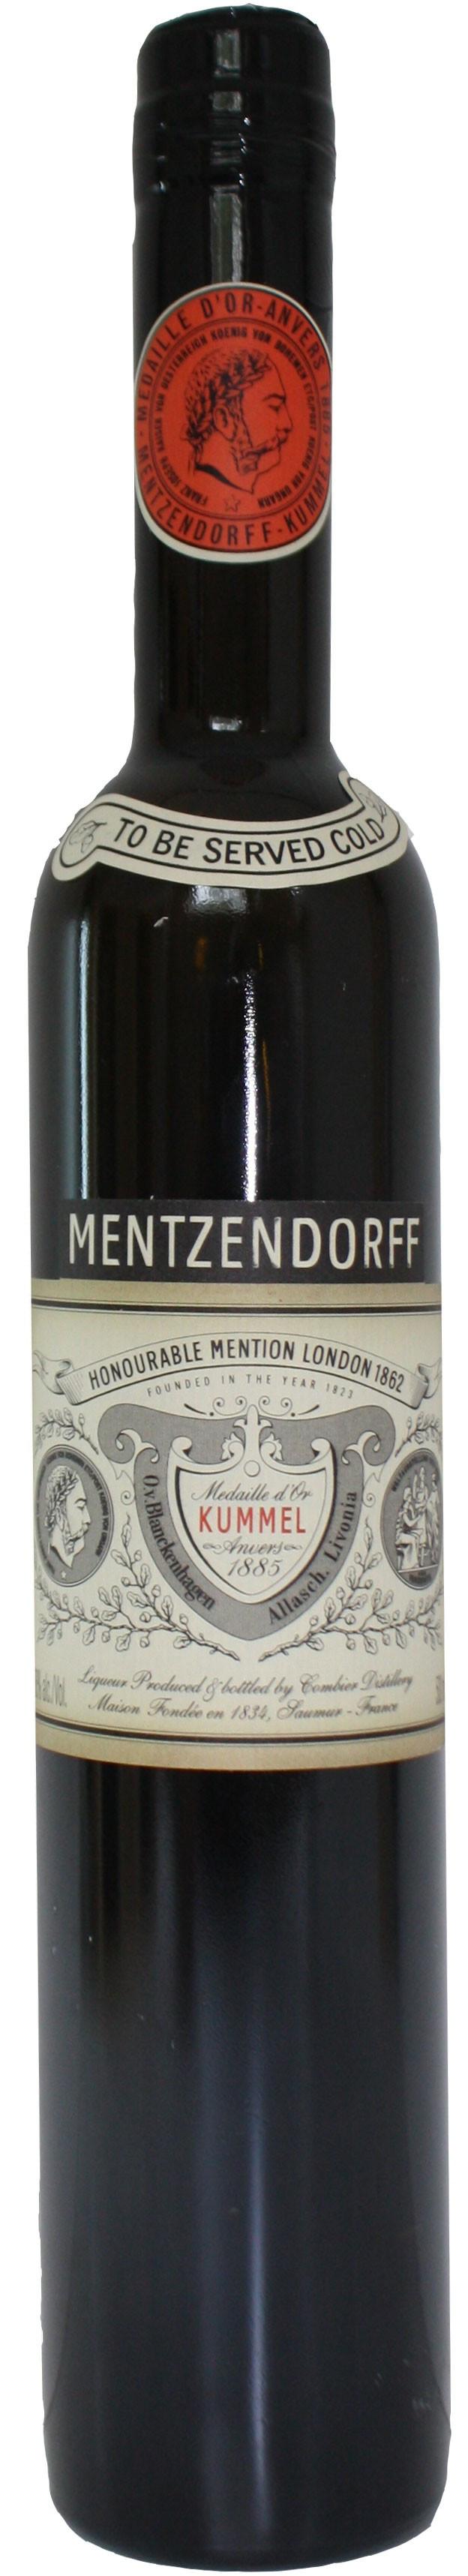 Mentzendorff Kummel